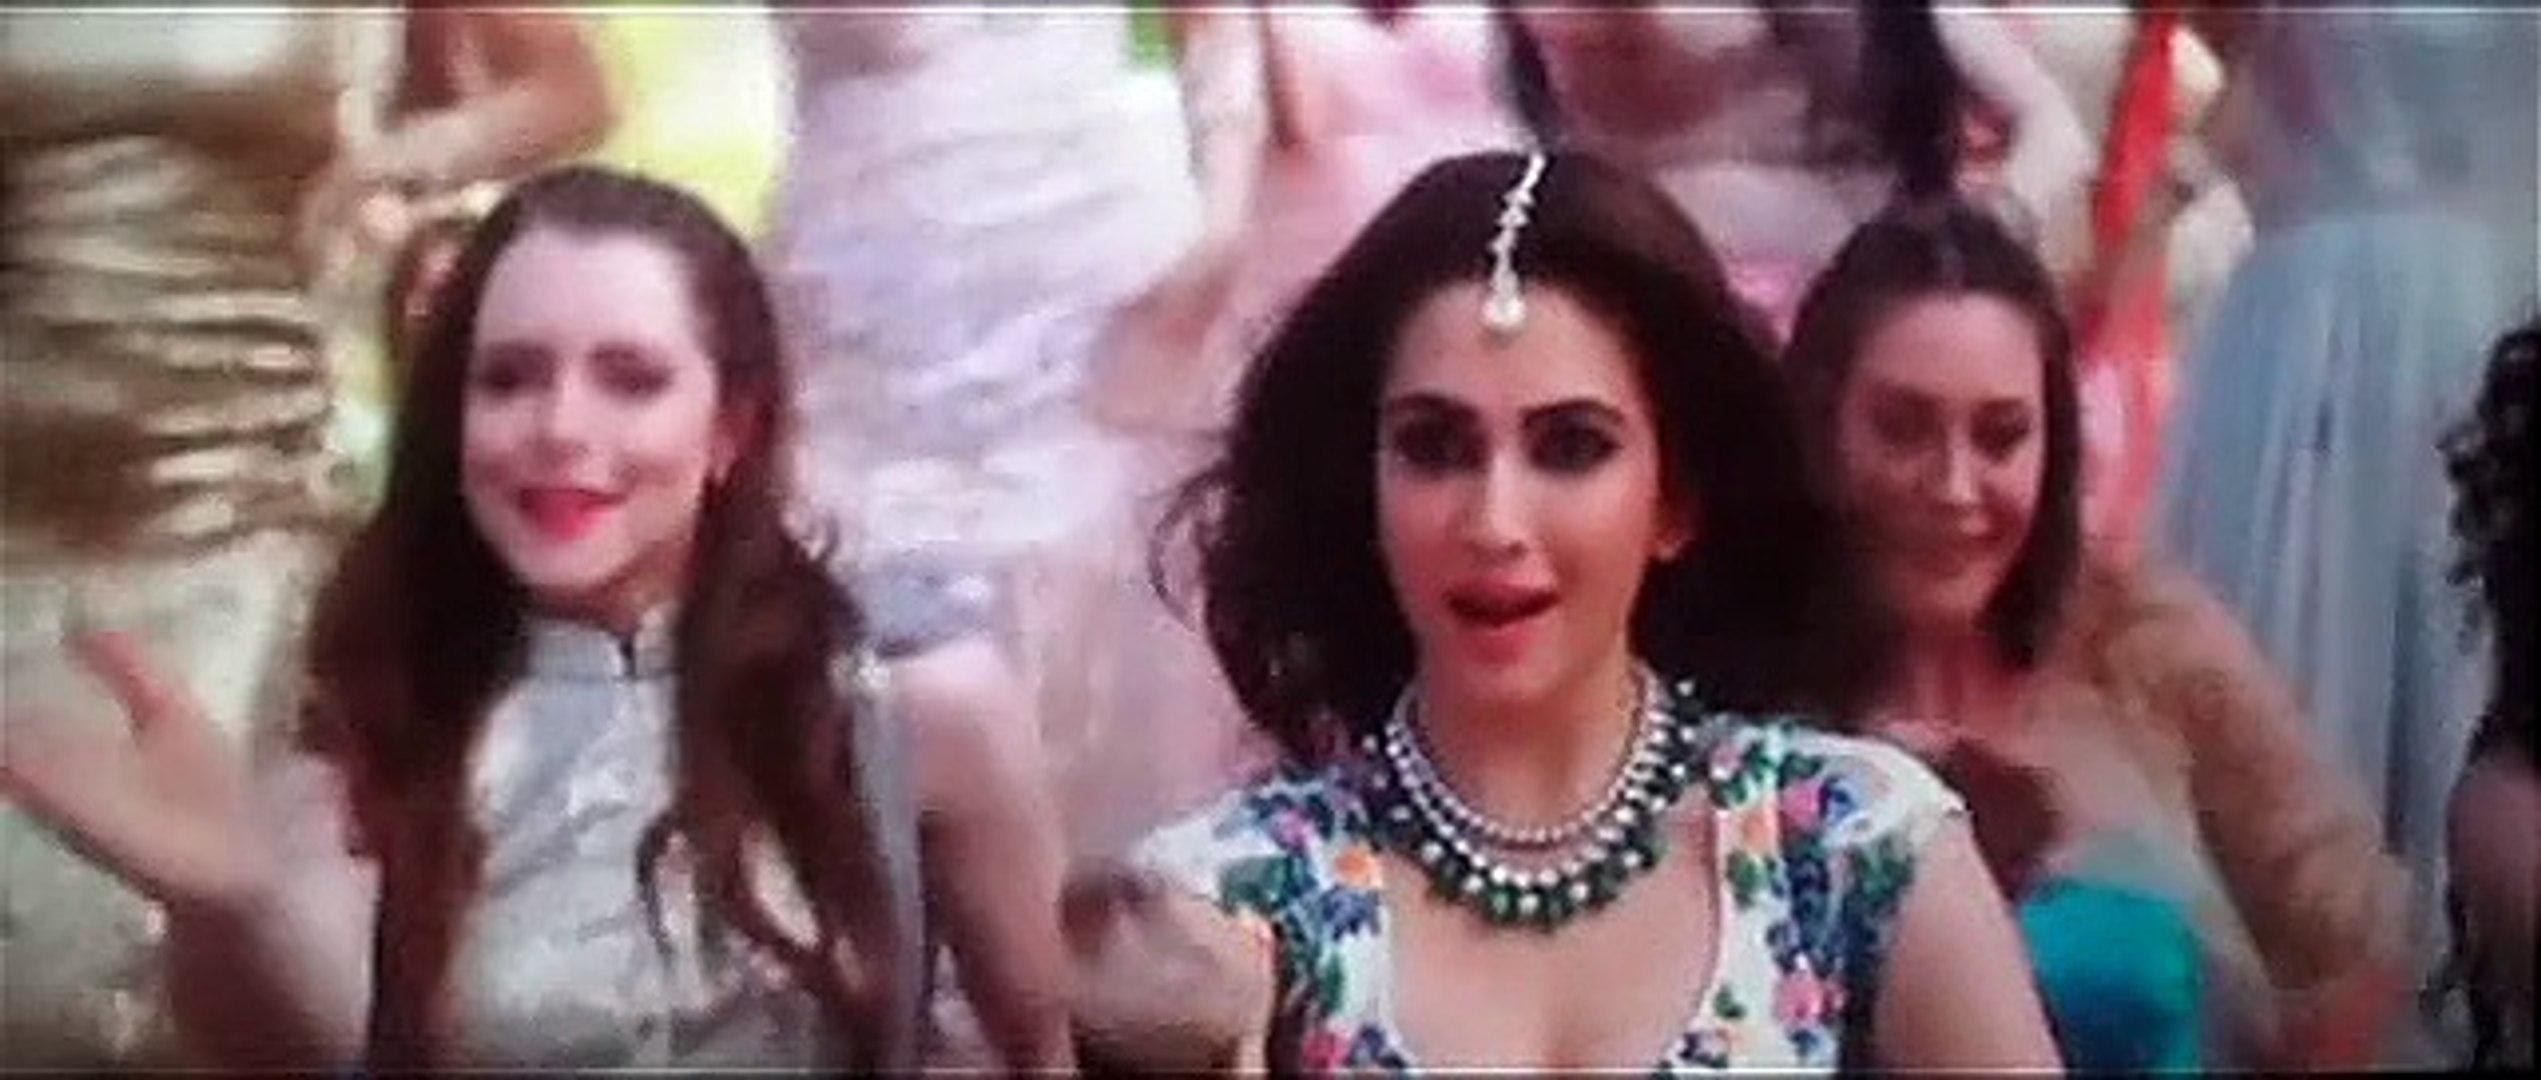 G-u-e-s-t  i-i-n  L-o-n-d-o-n  (2017) Hindi _ PART 2